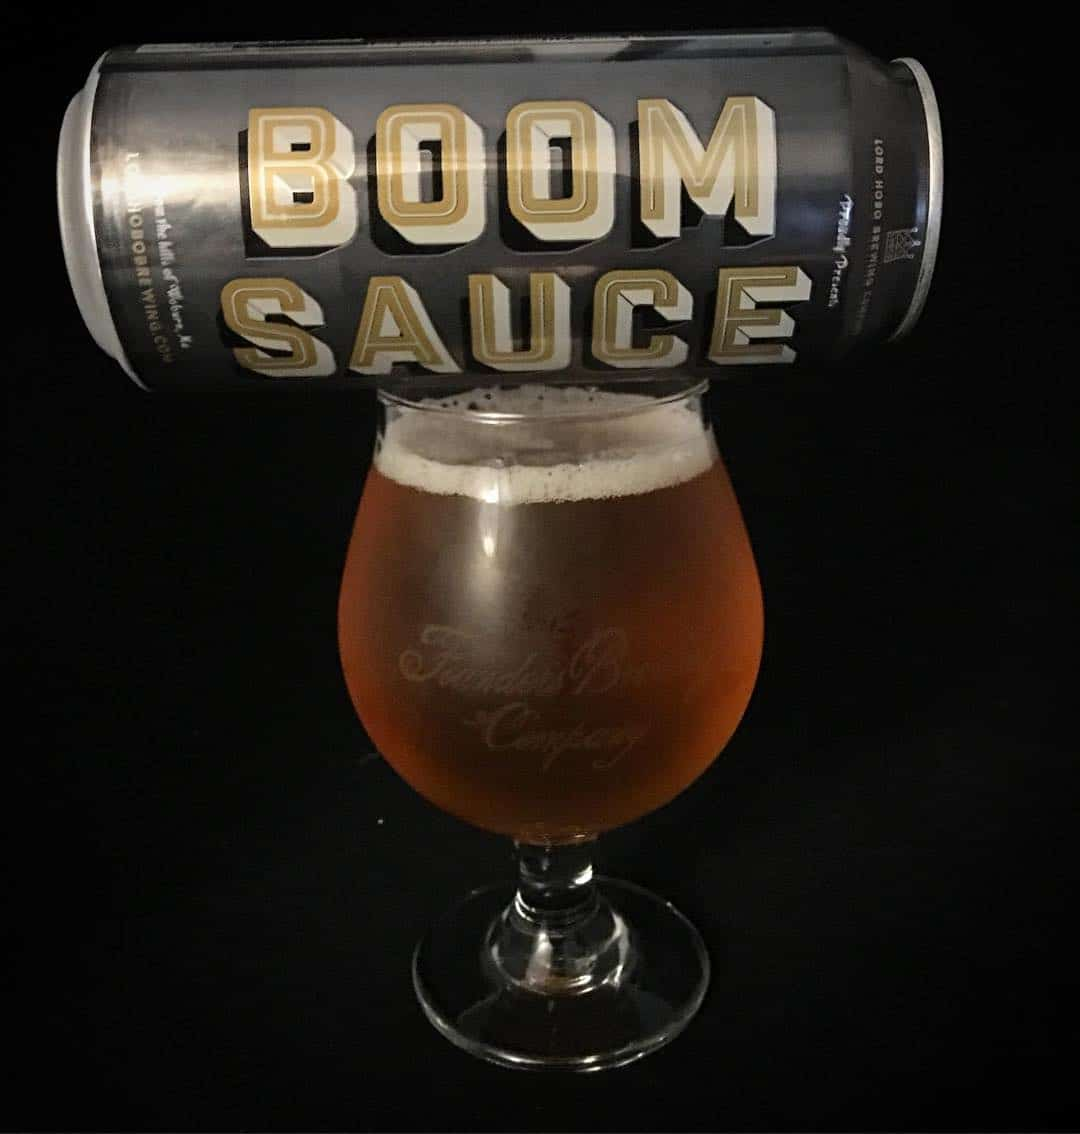 Boomsauce